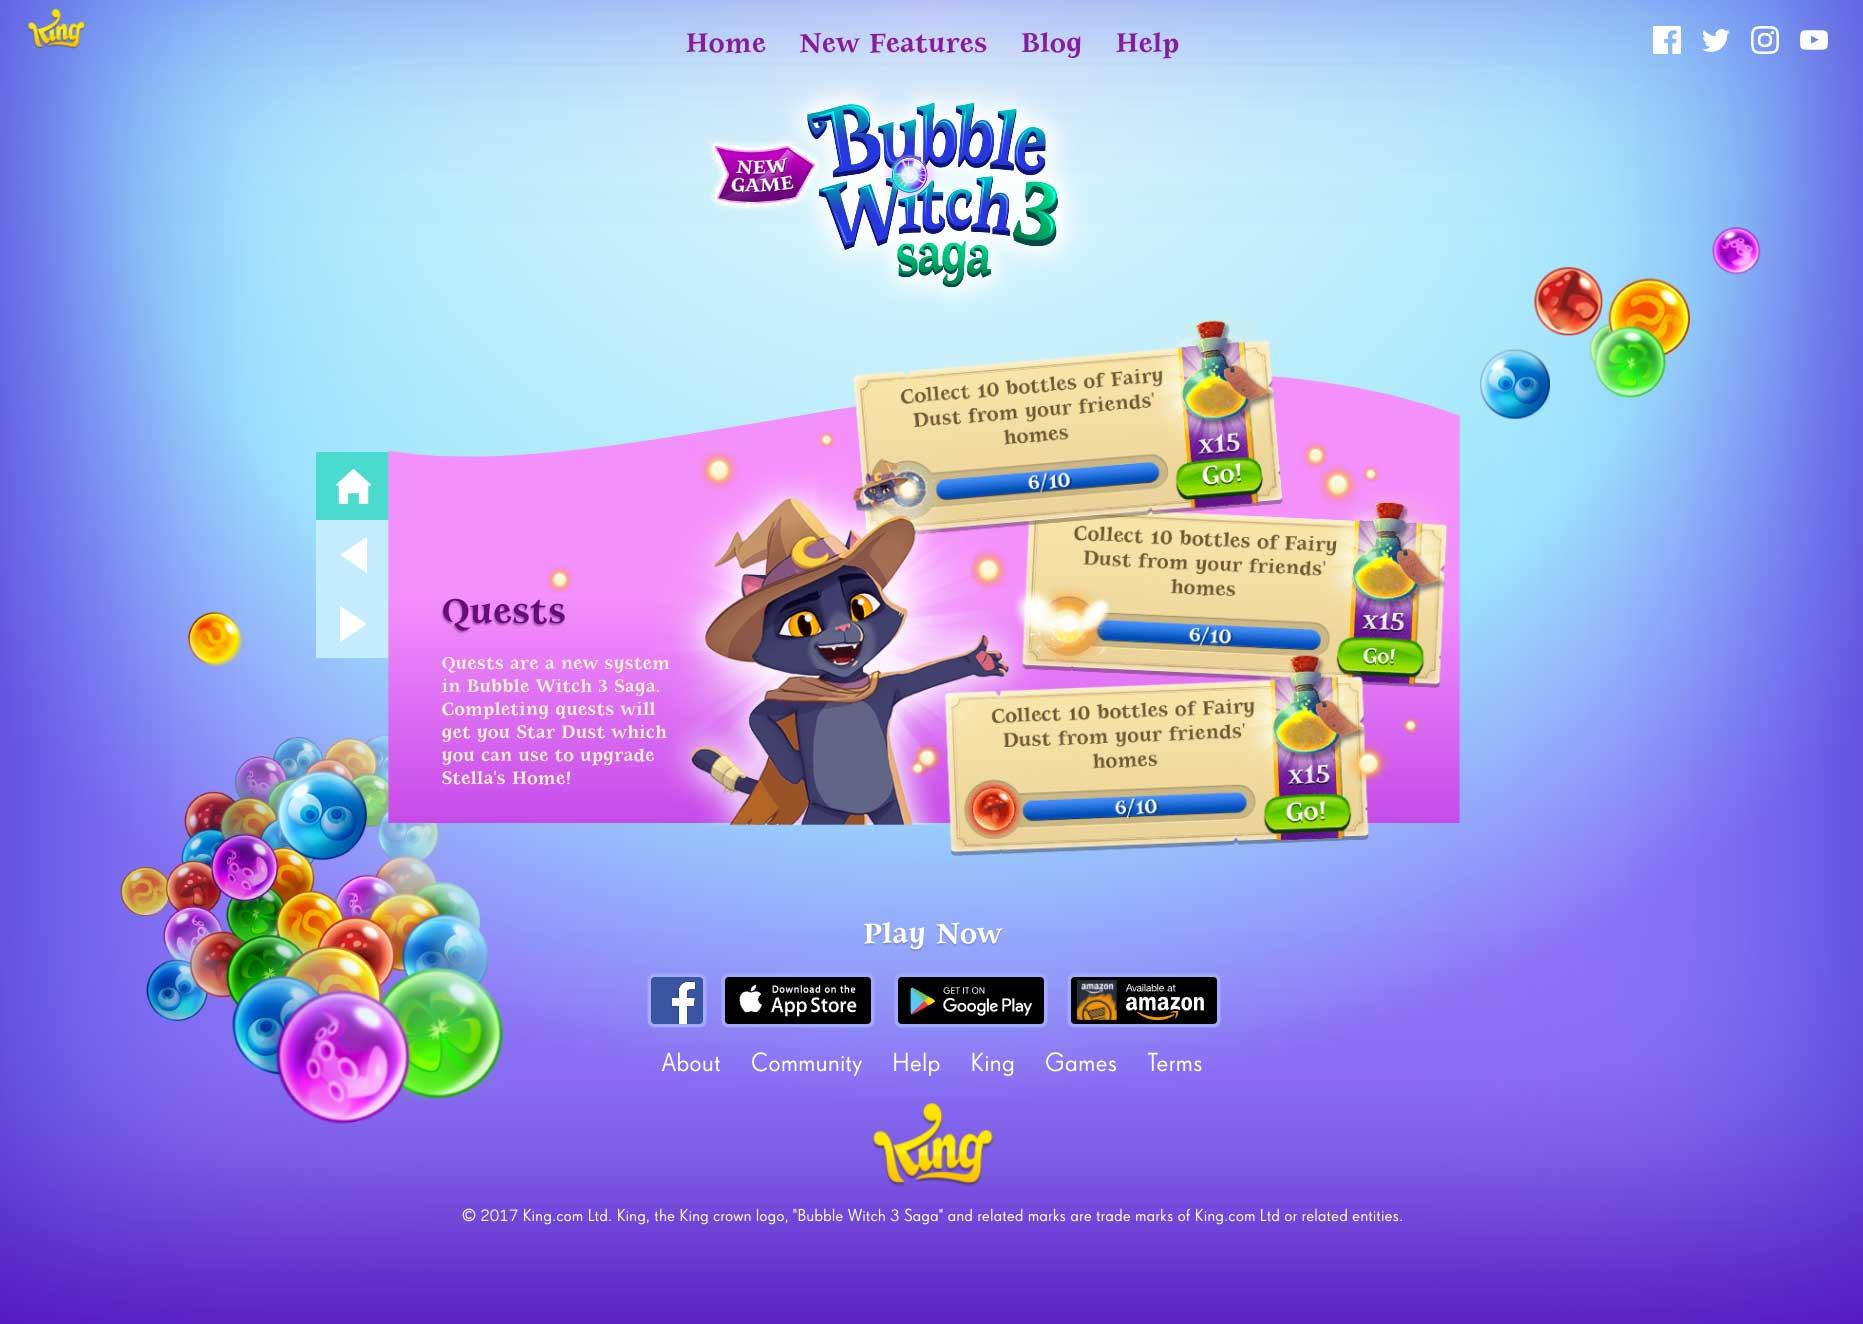 bubble witch 3 saga digital